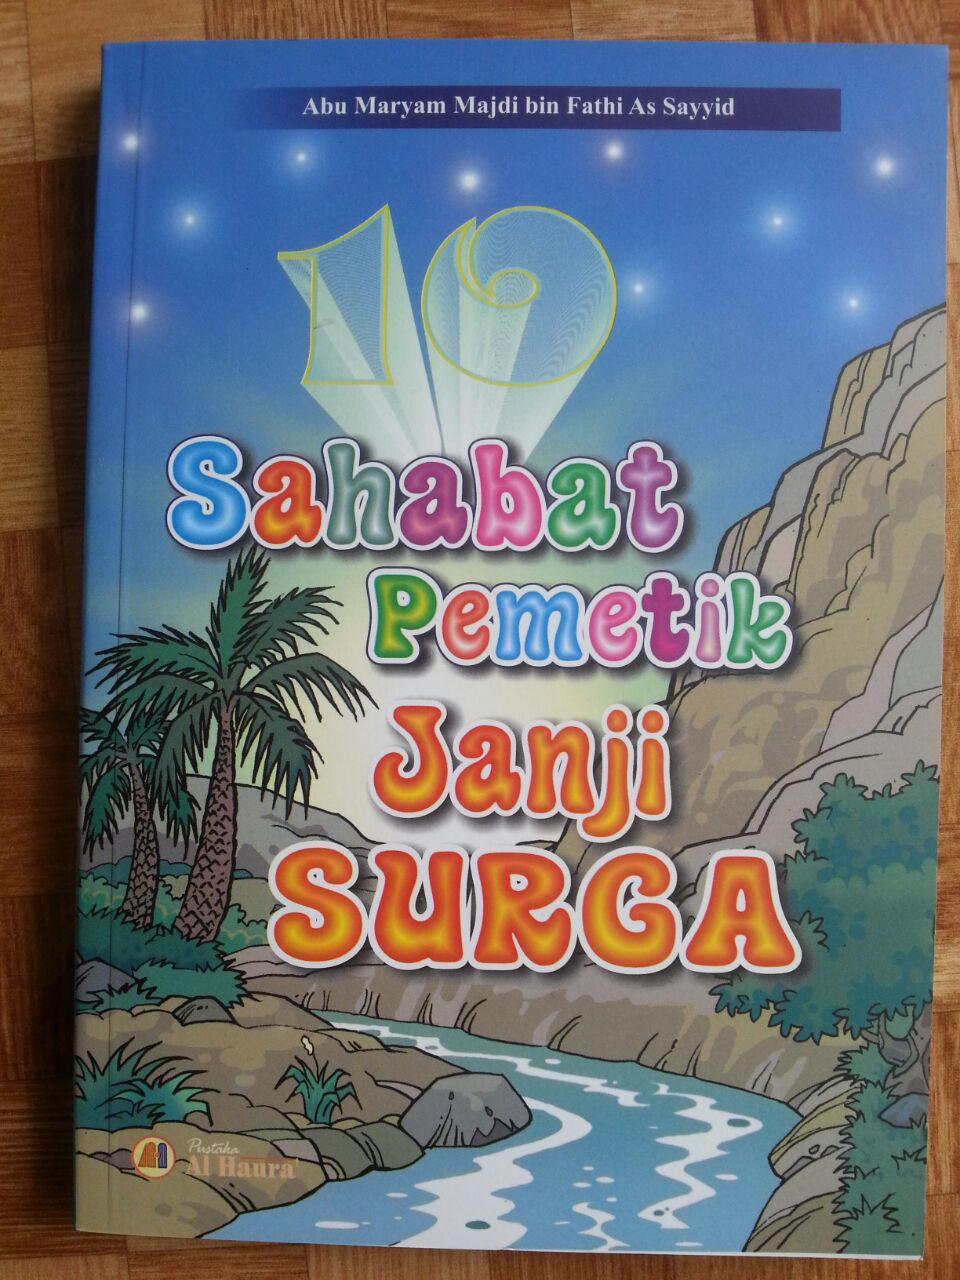 Buku 10 Sahabat Pemetik Janji Surga cover 2